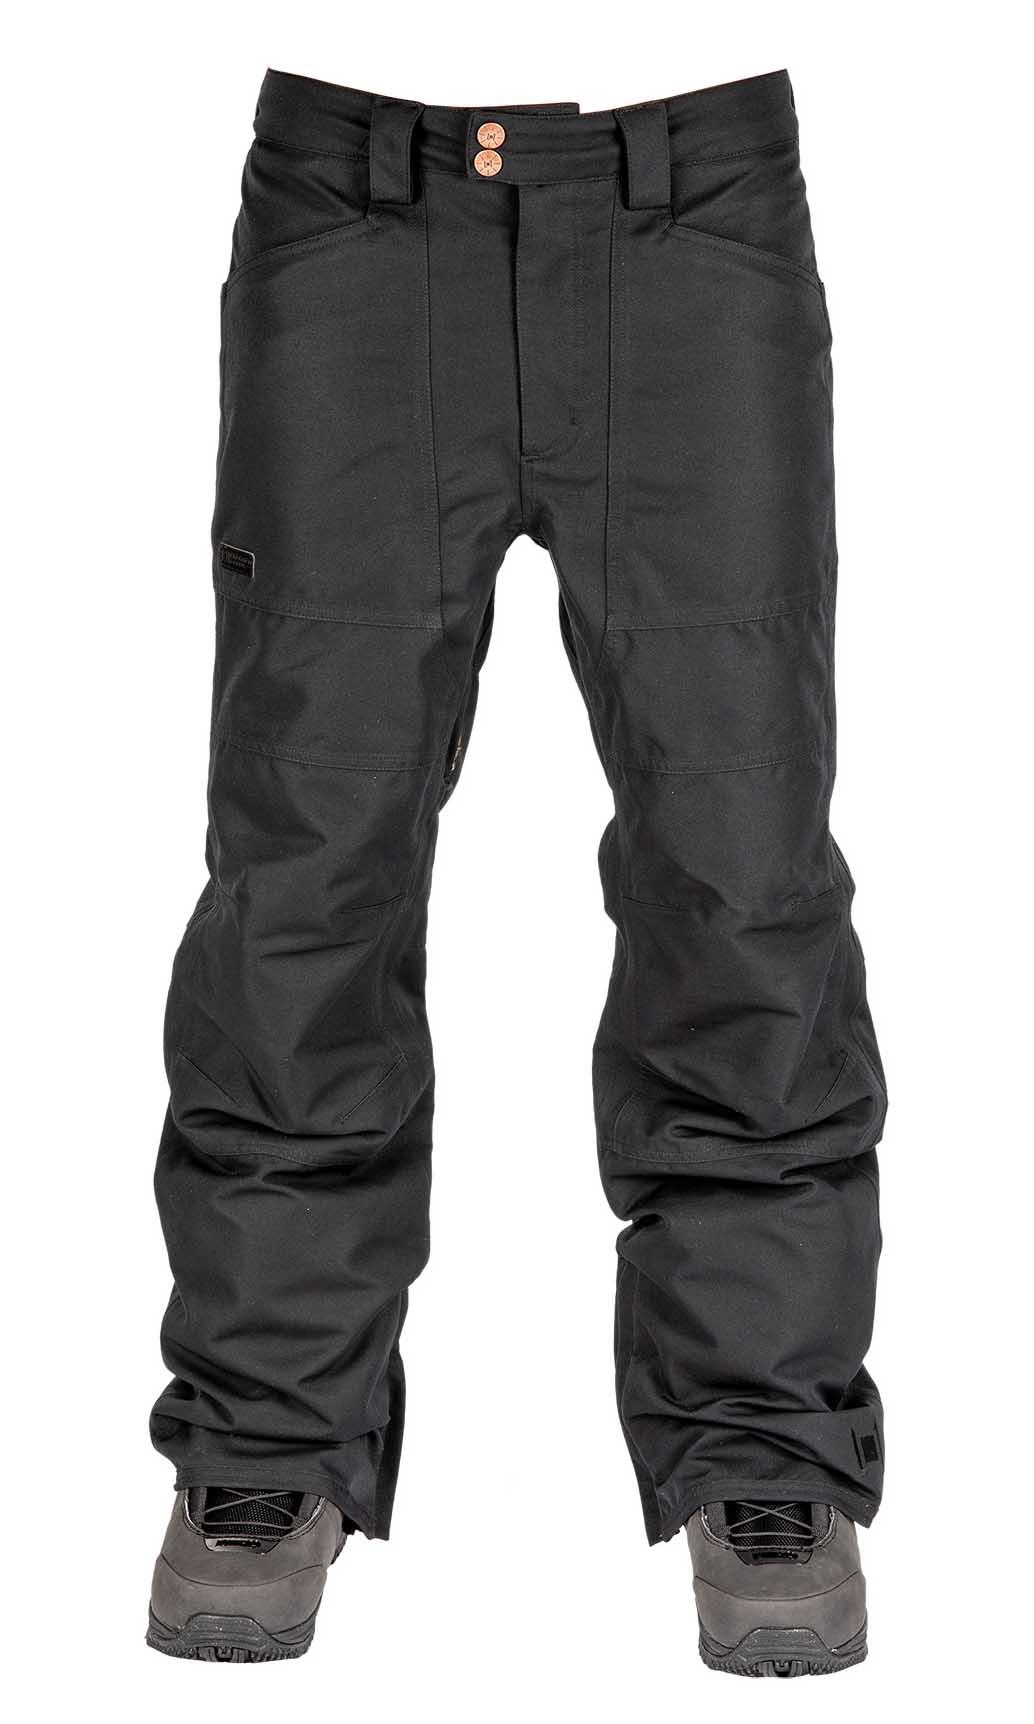 L1 Premium Goods Americana Ski/Snowboard Pants, S Black